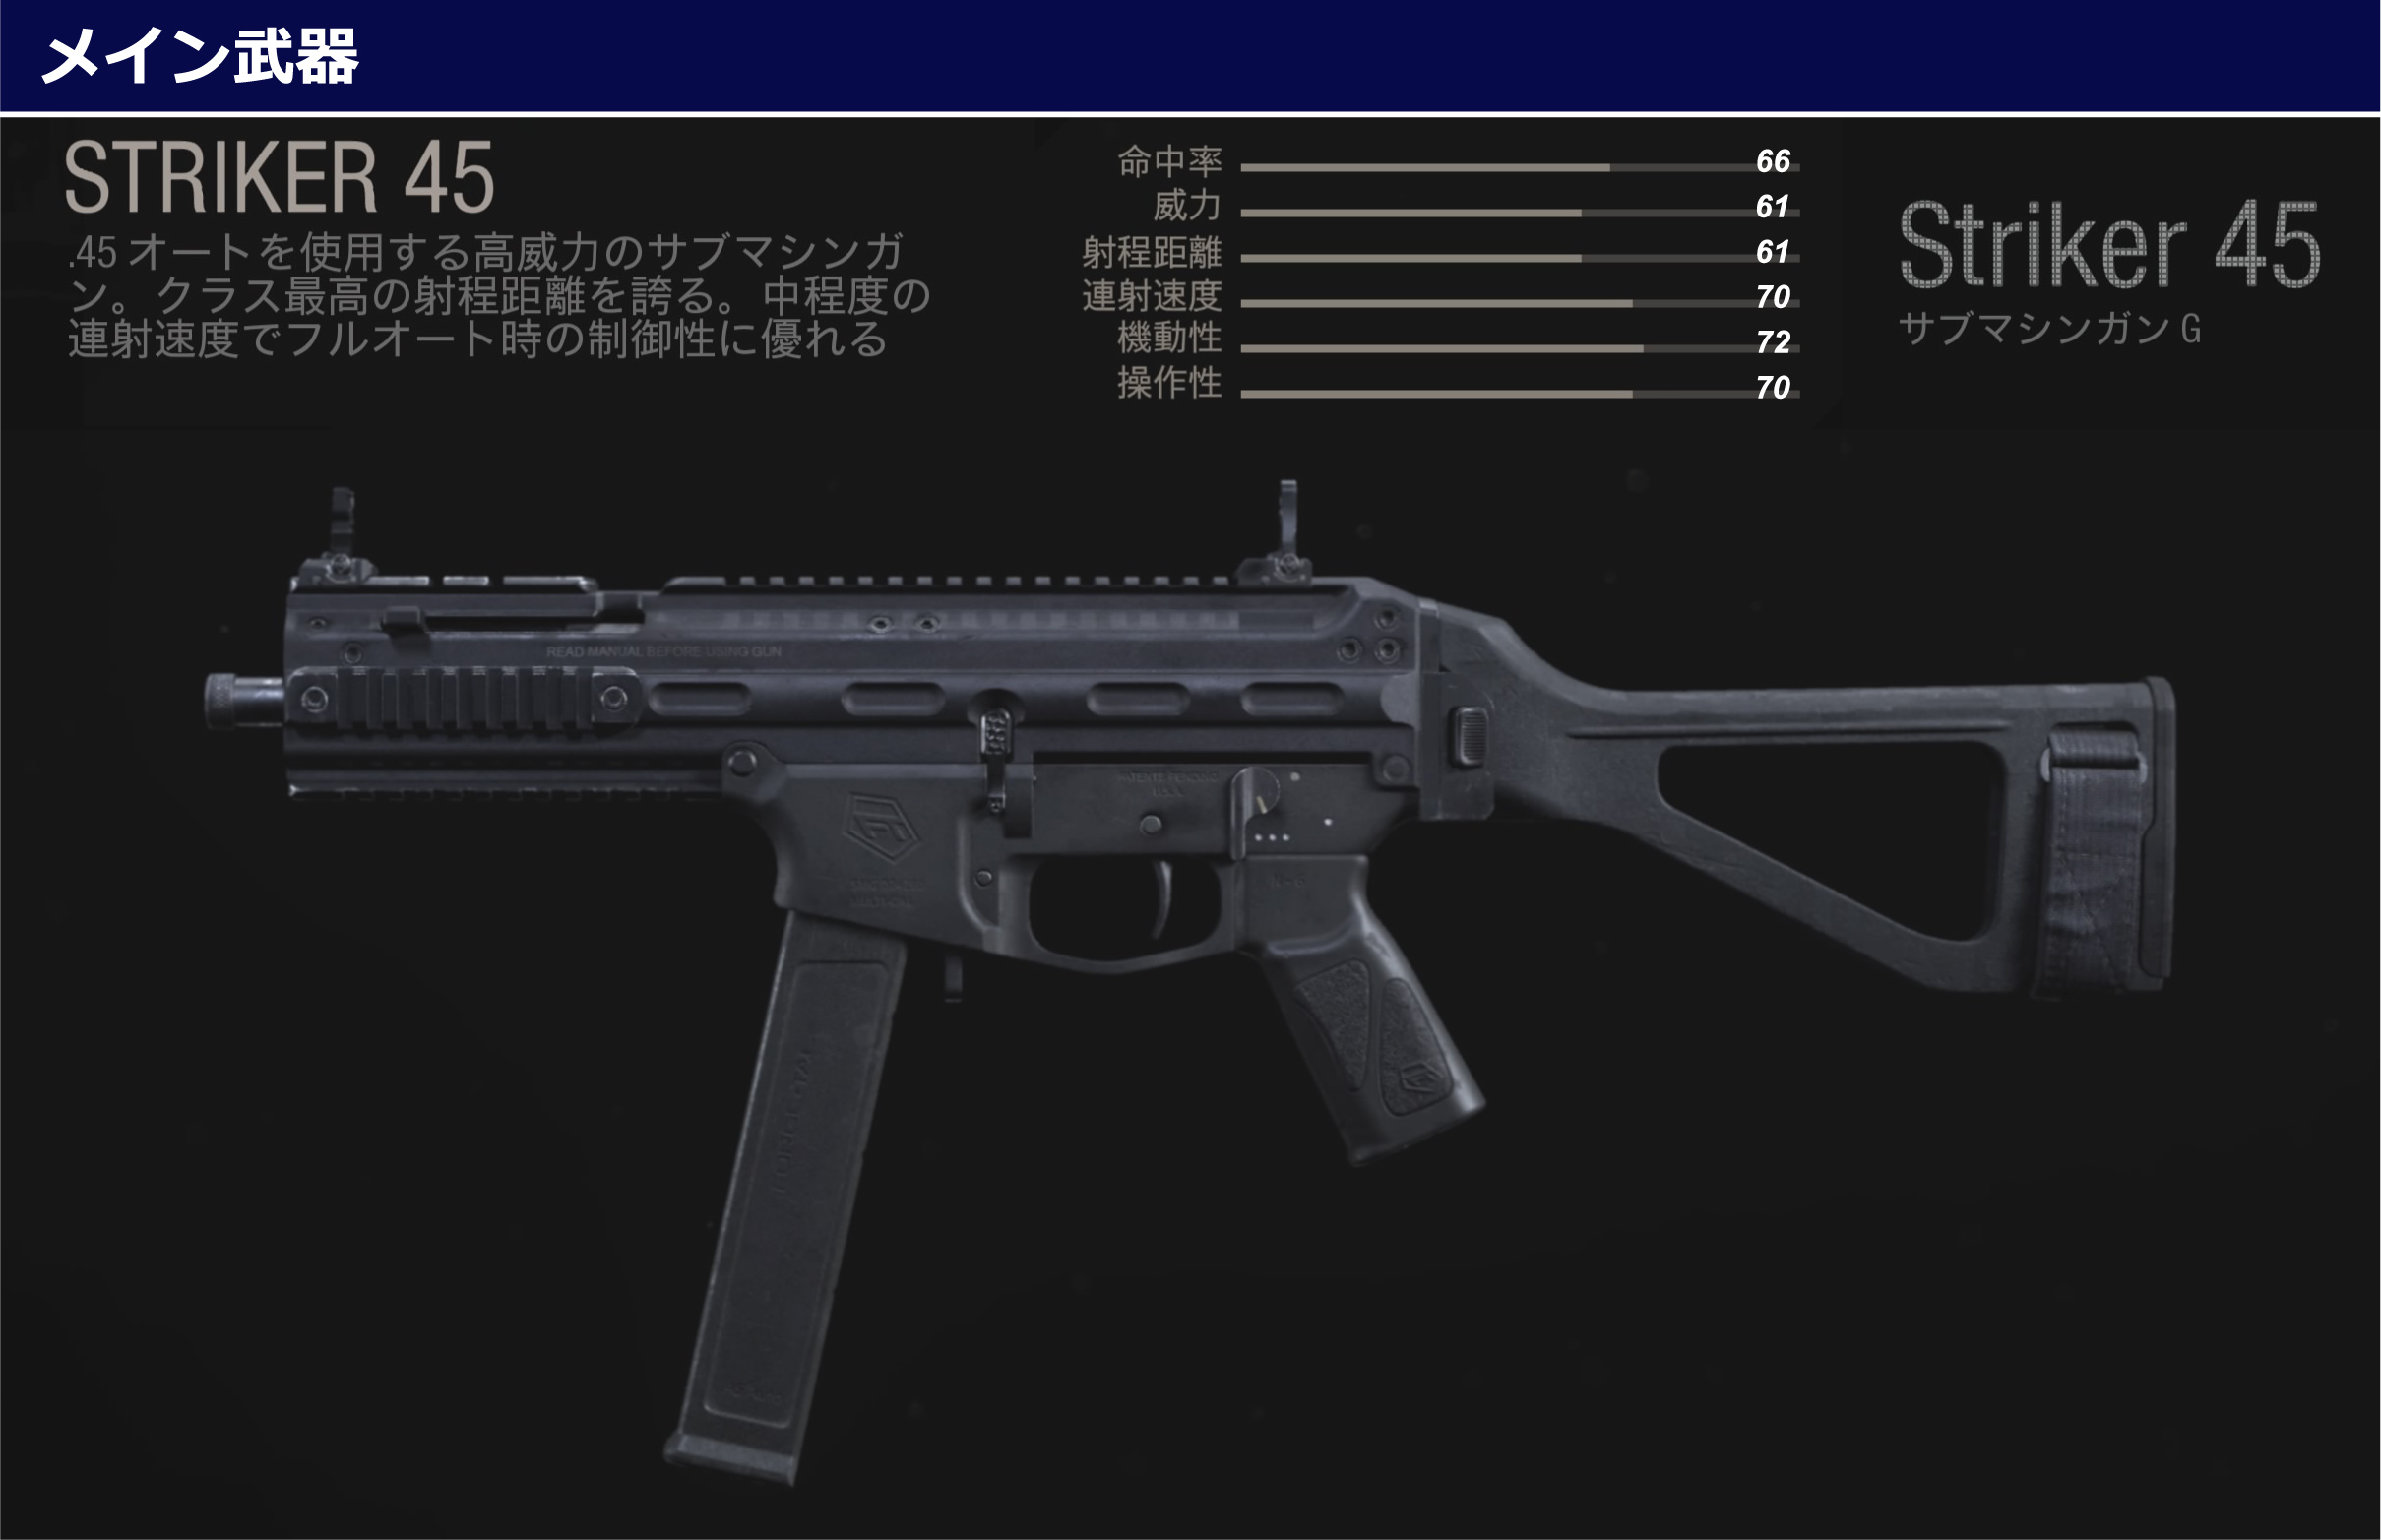 Striker-45